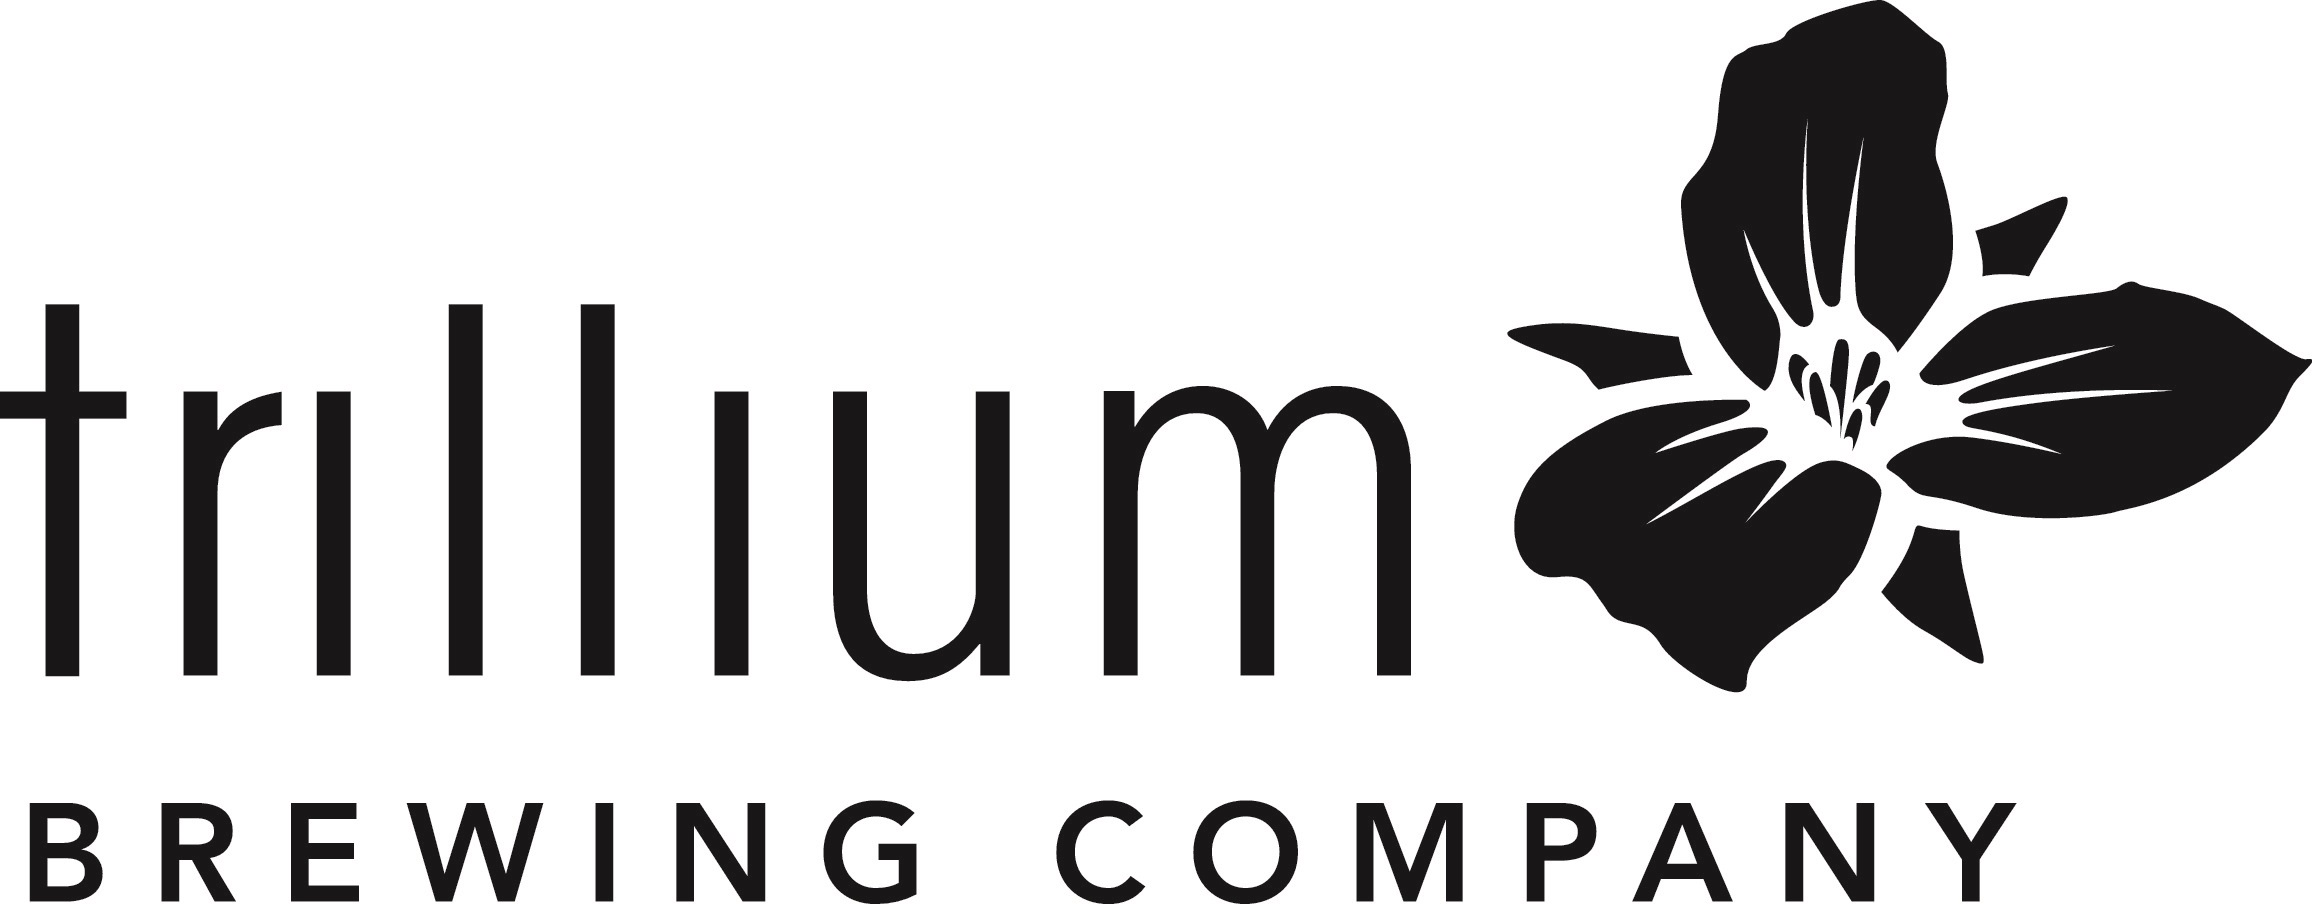 Trillium Brewery